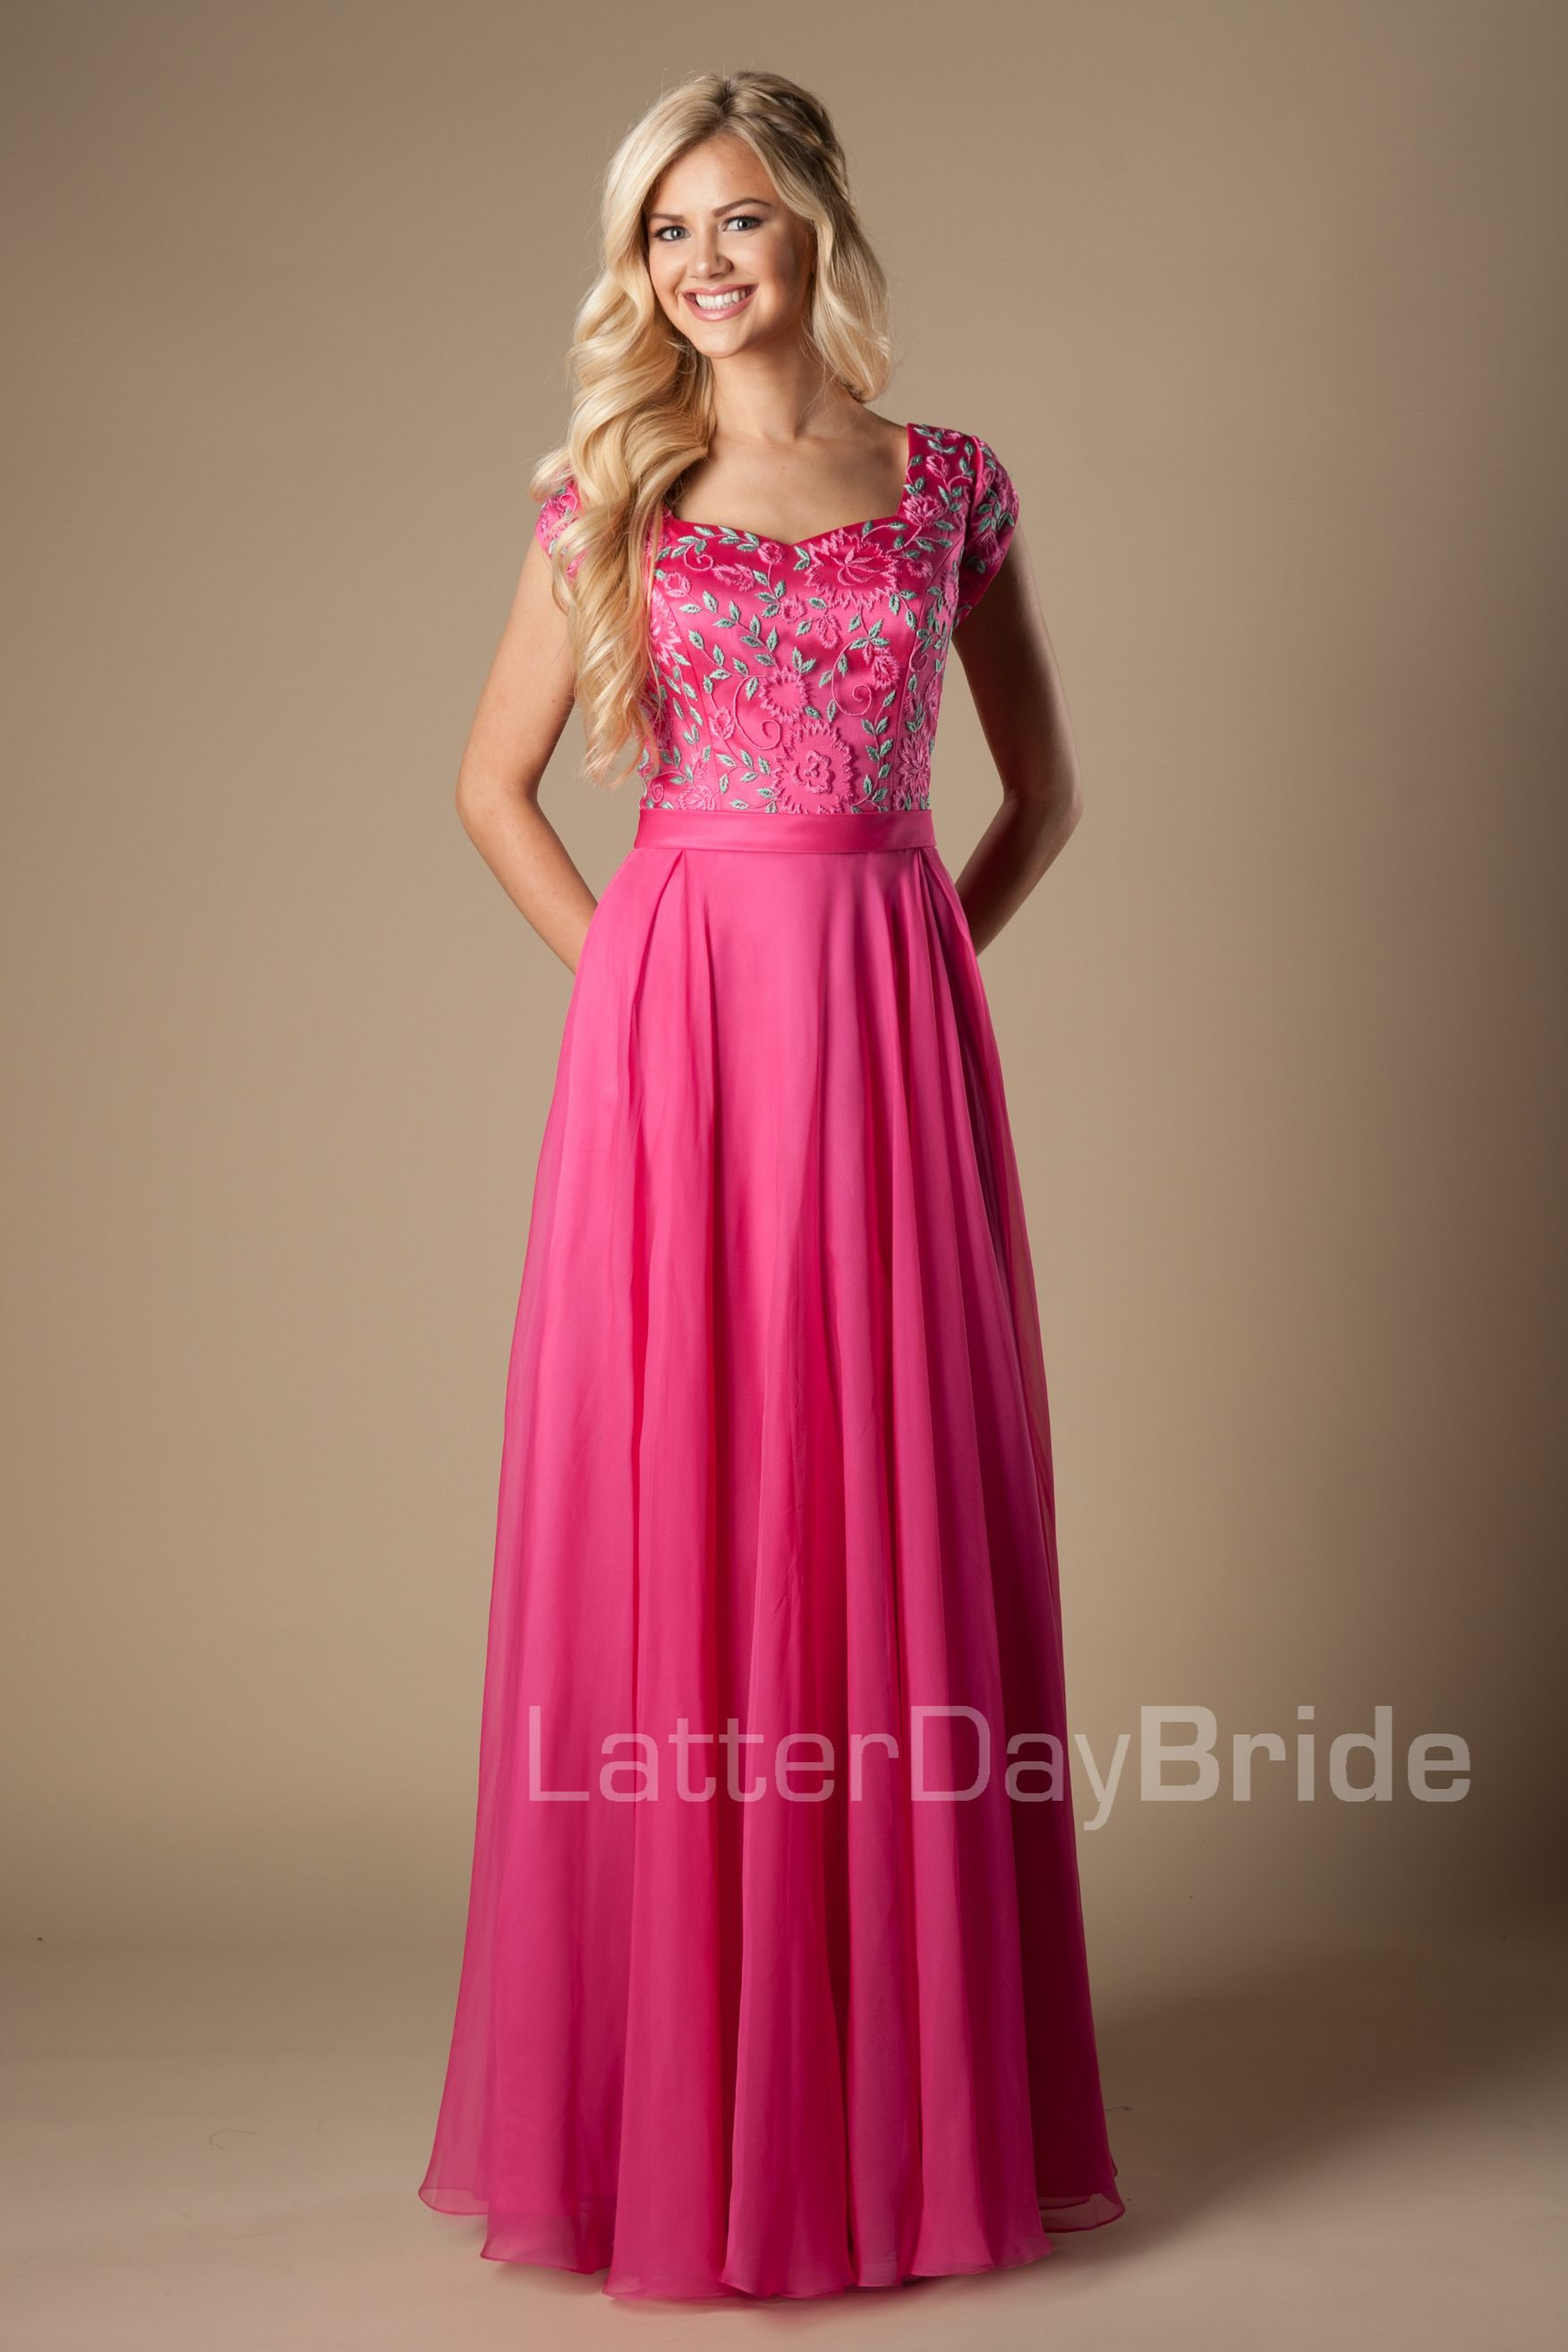 Modest Prom Dresses : Josie | Prom Dresses<3 | Pinterest | Vestido ...